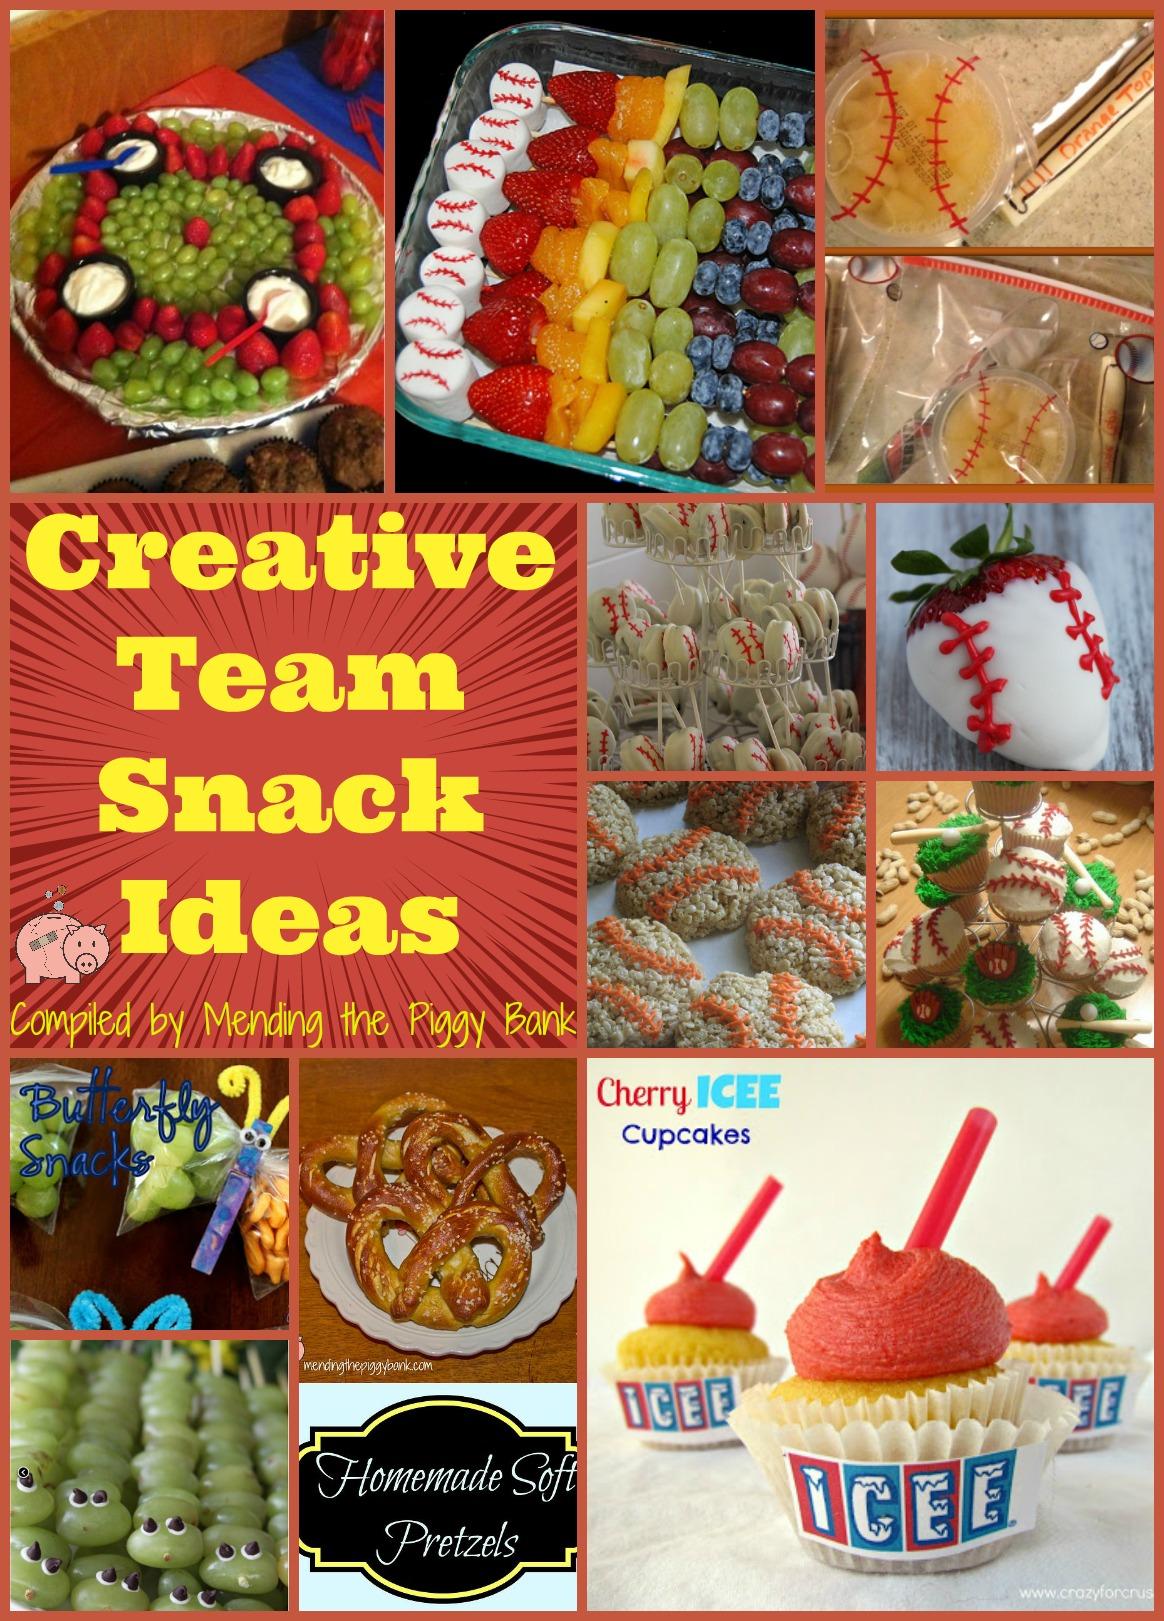 Creative Team Snack Ideas   Mending the Piggy Bank